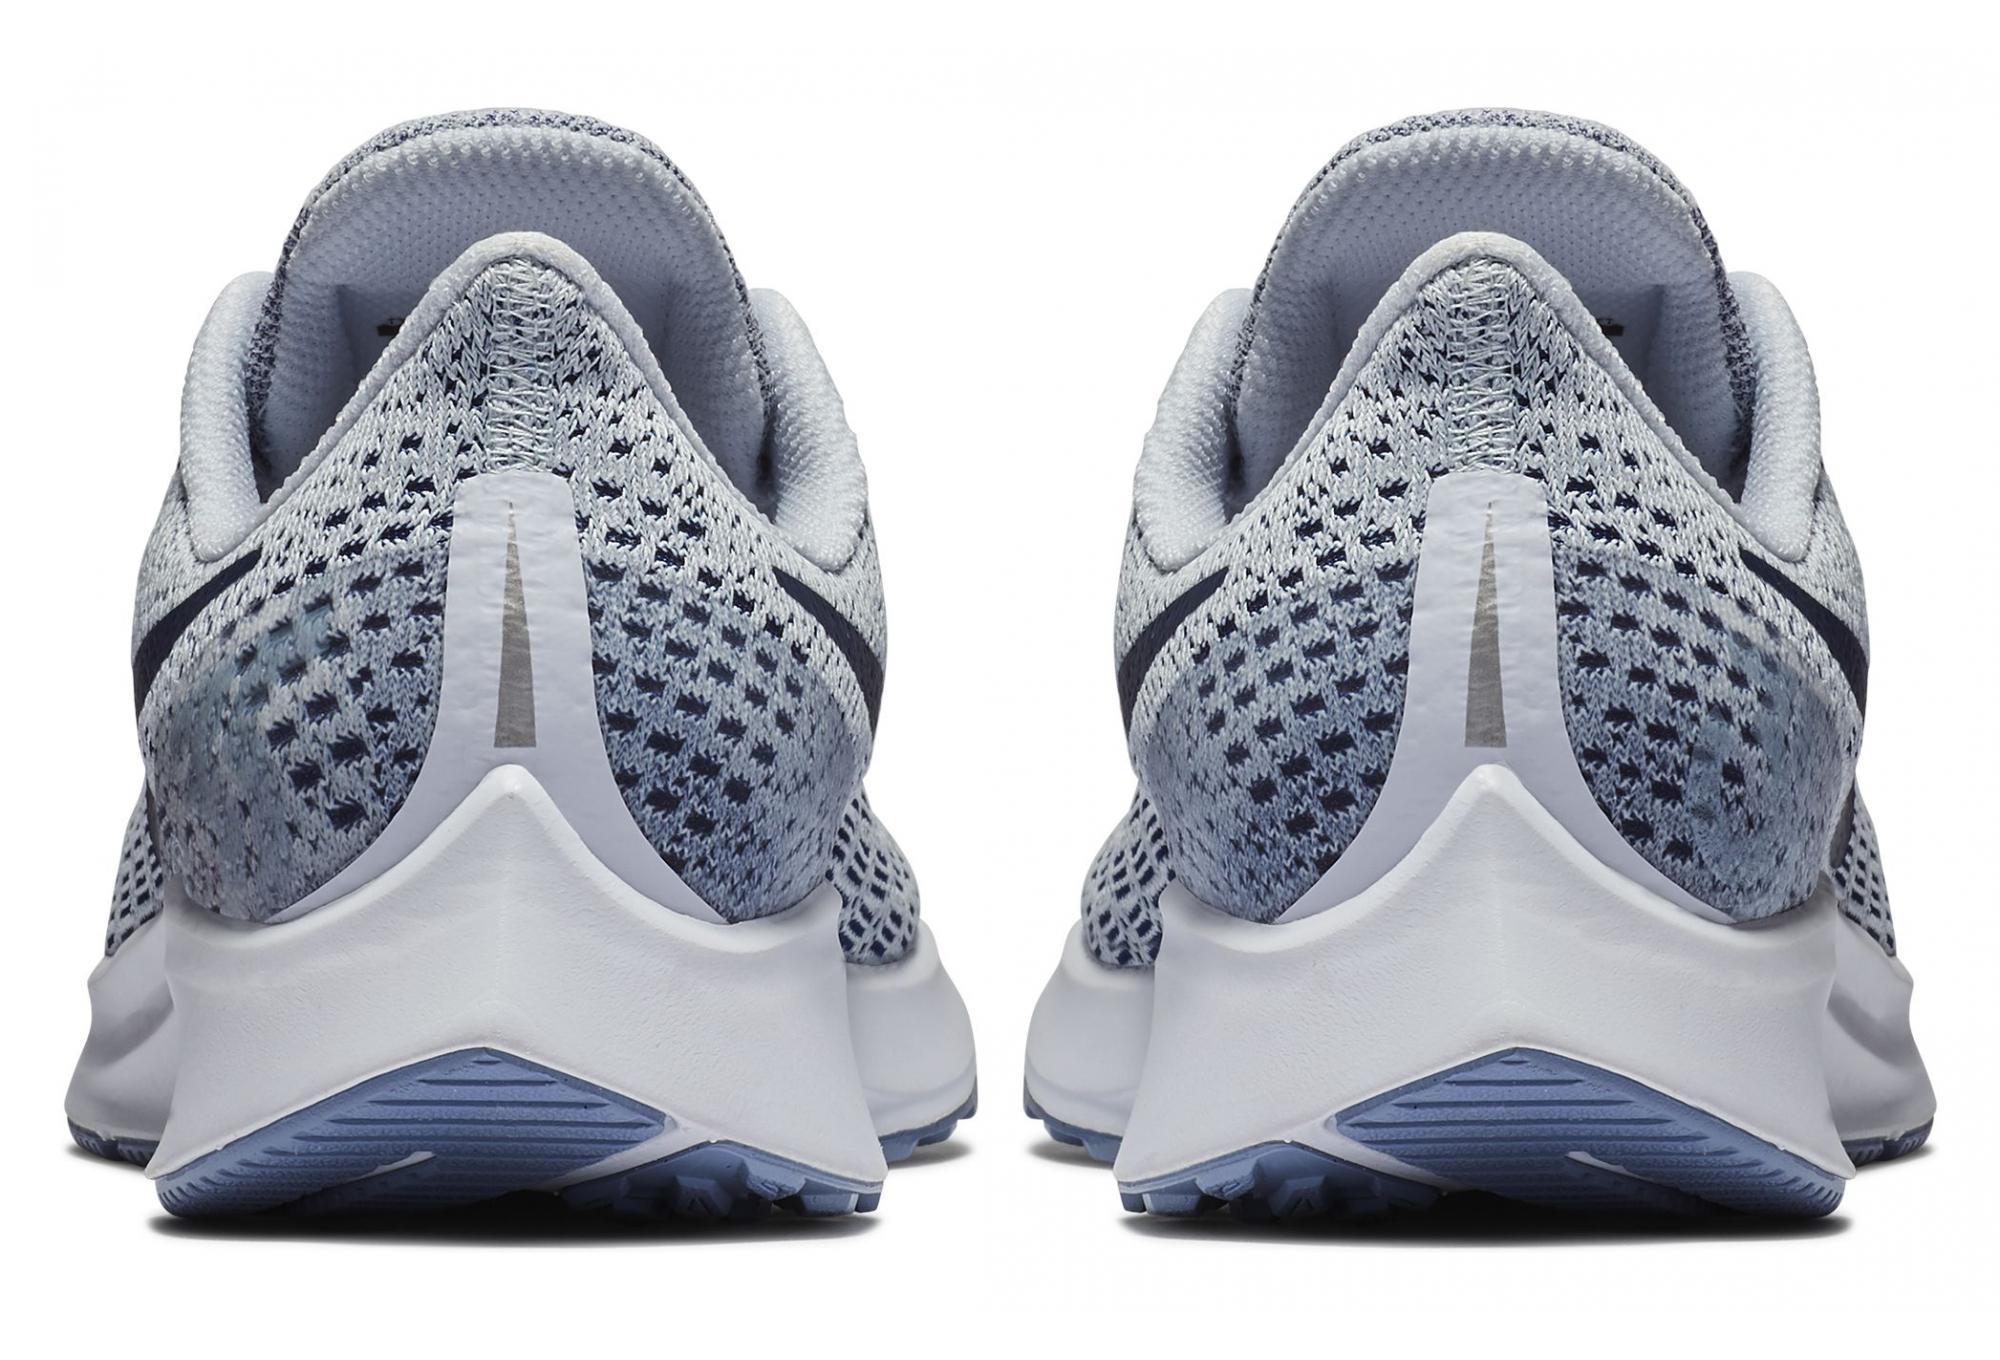 Bleu Chaussures Gris Running Pegasus Zoom De Nike Air Femme 35 778wZr